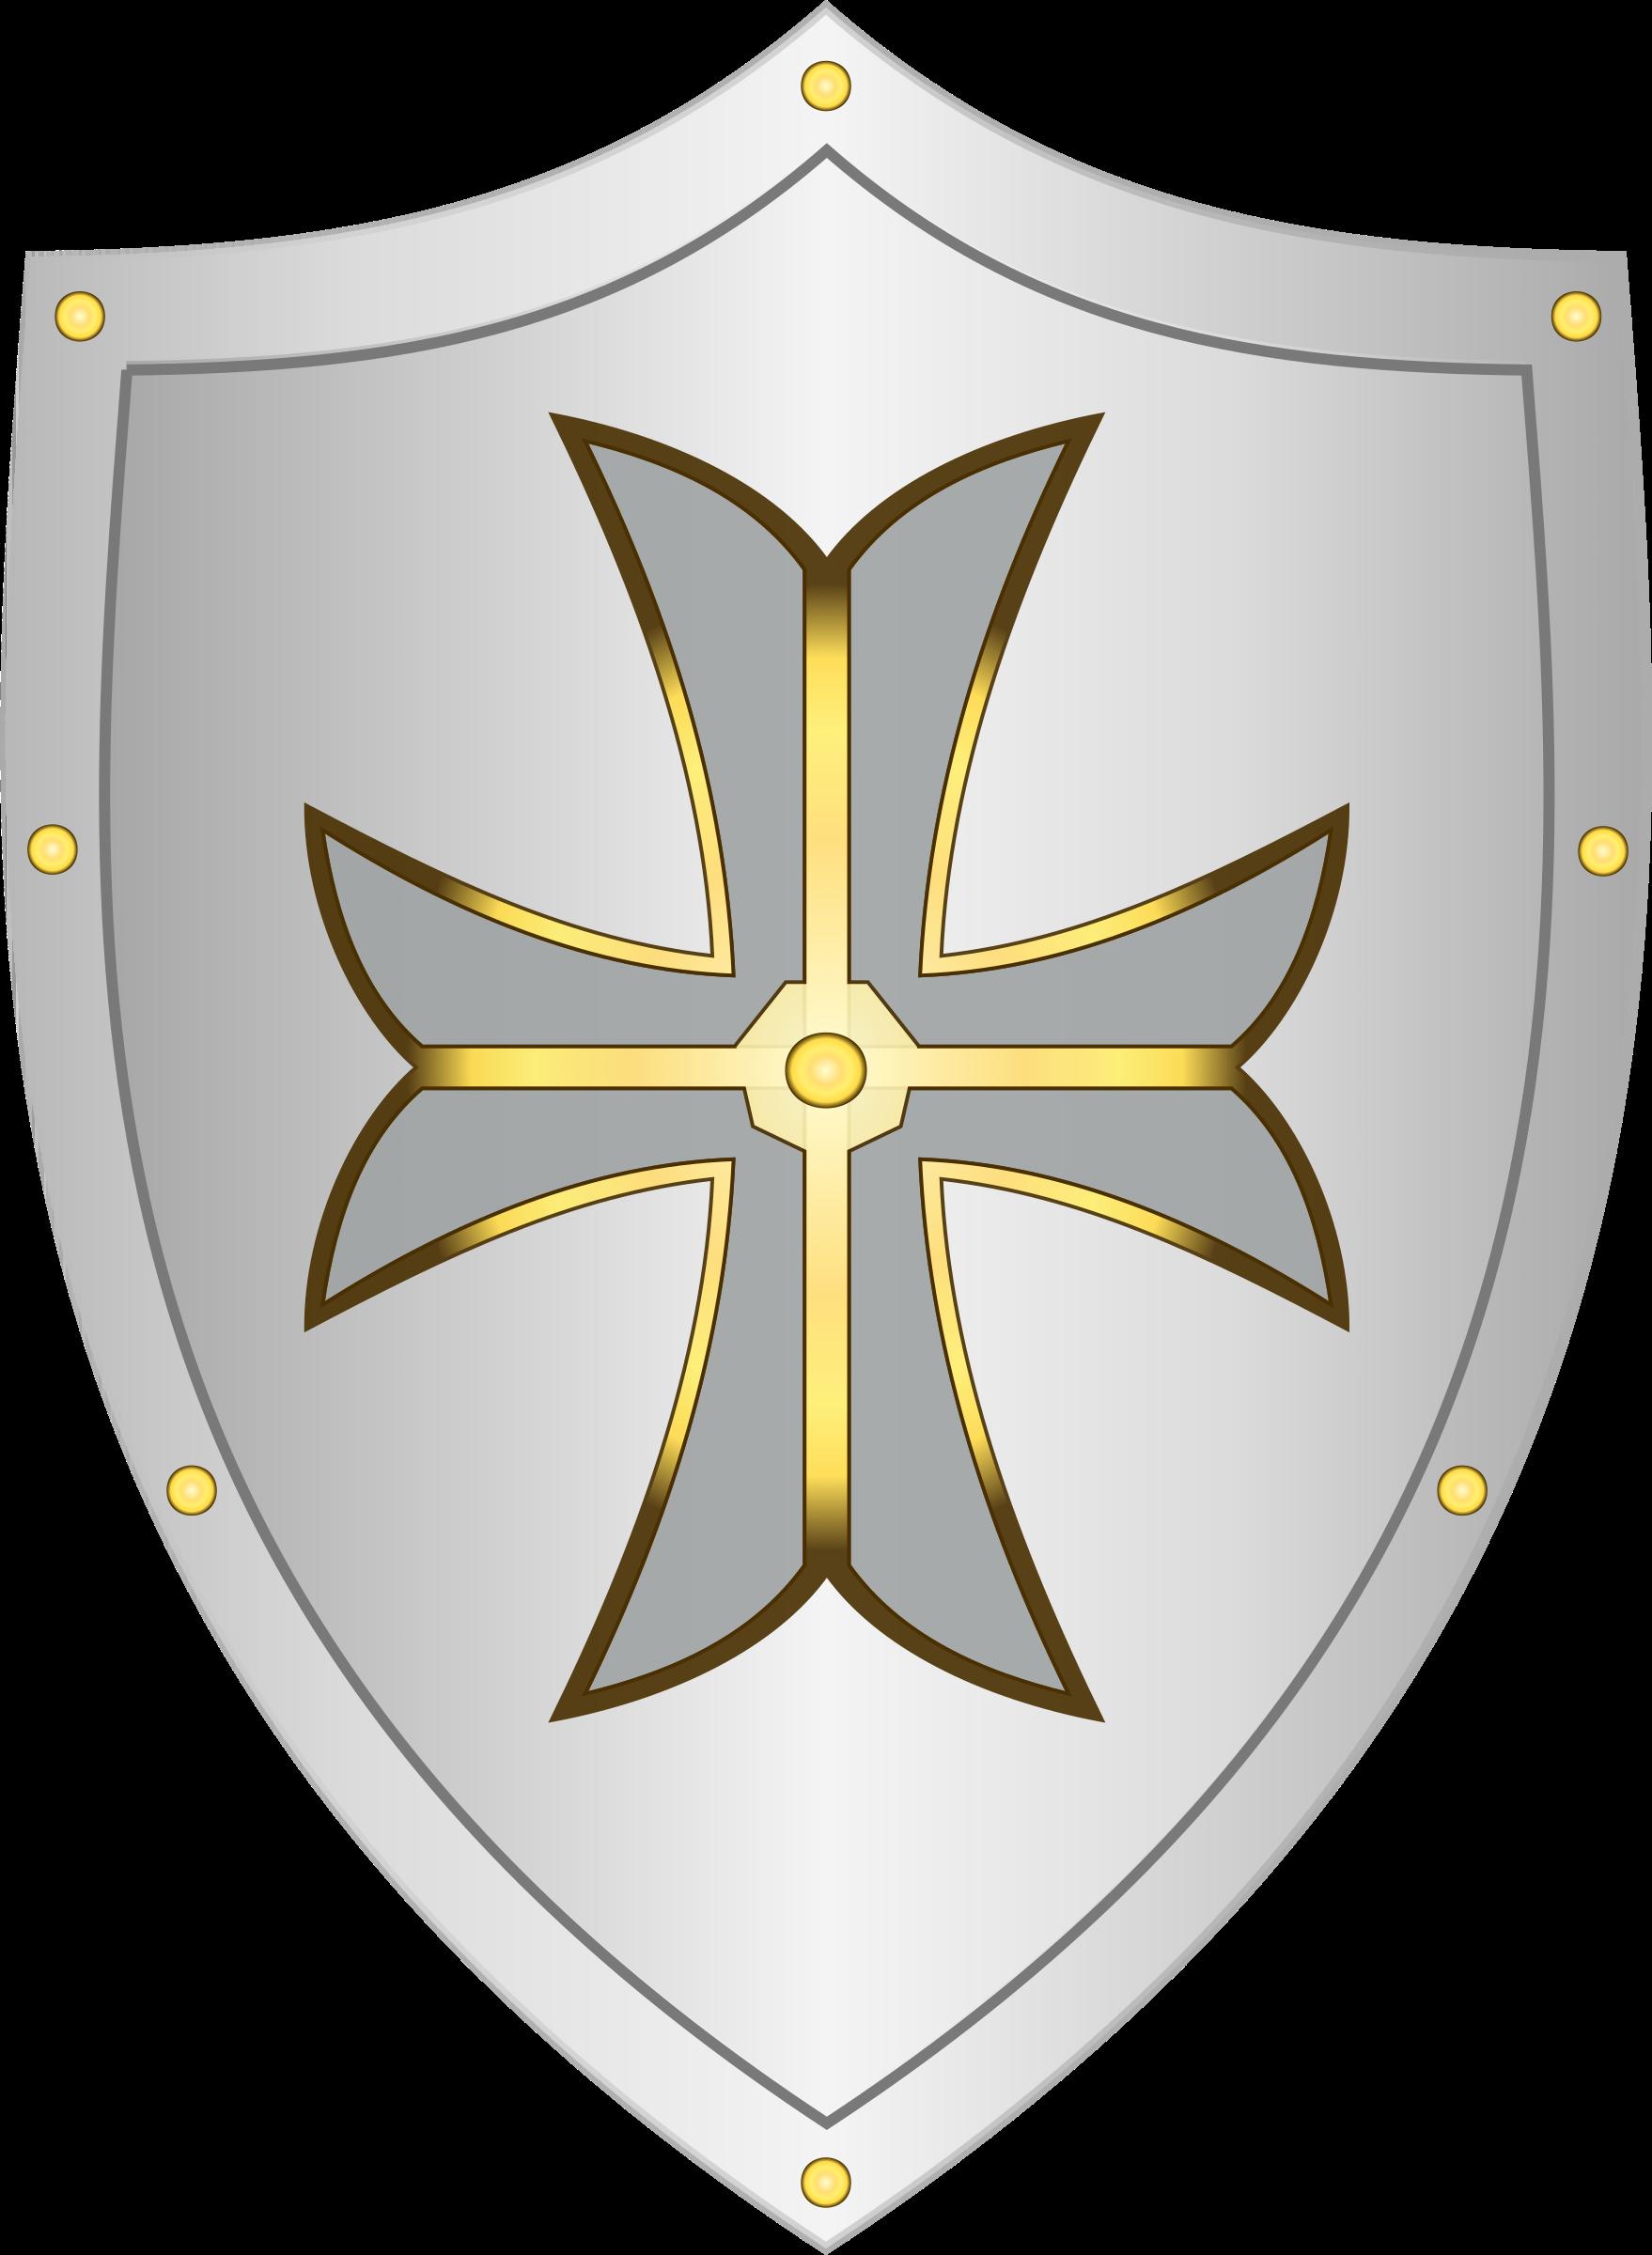 Medieval clipart medieval symbol, Medieval medieval symbol.